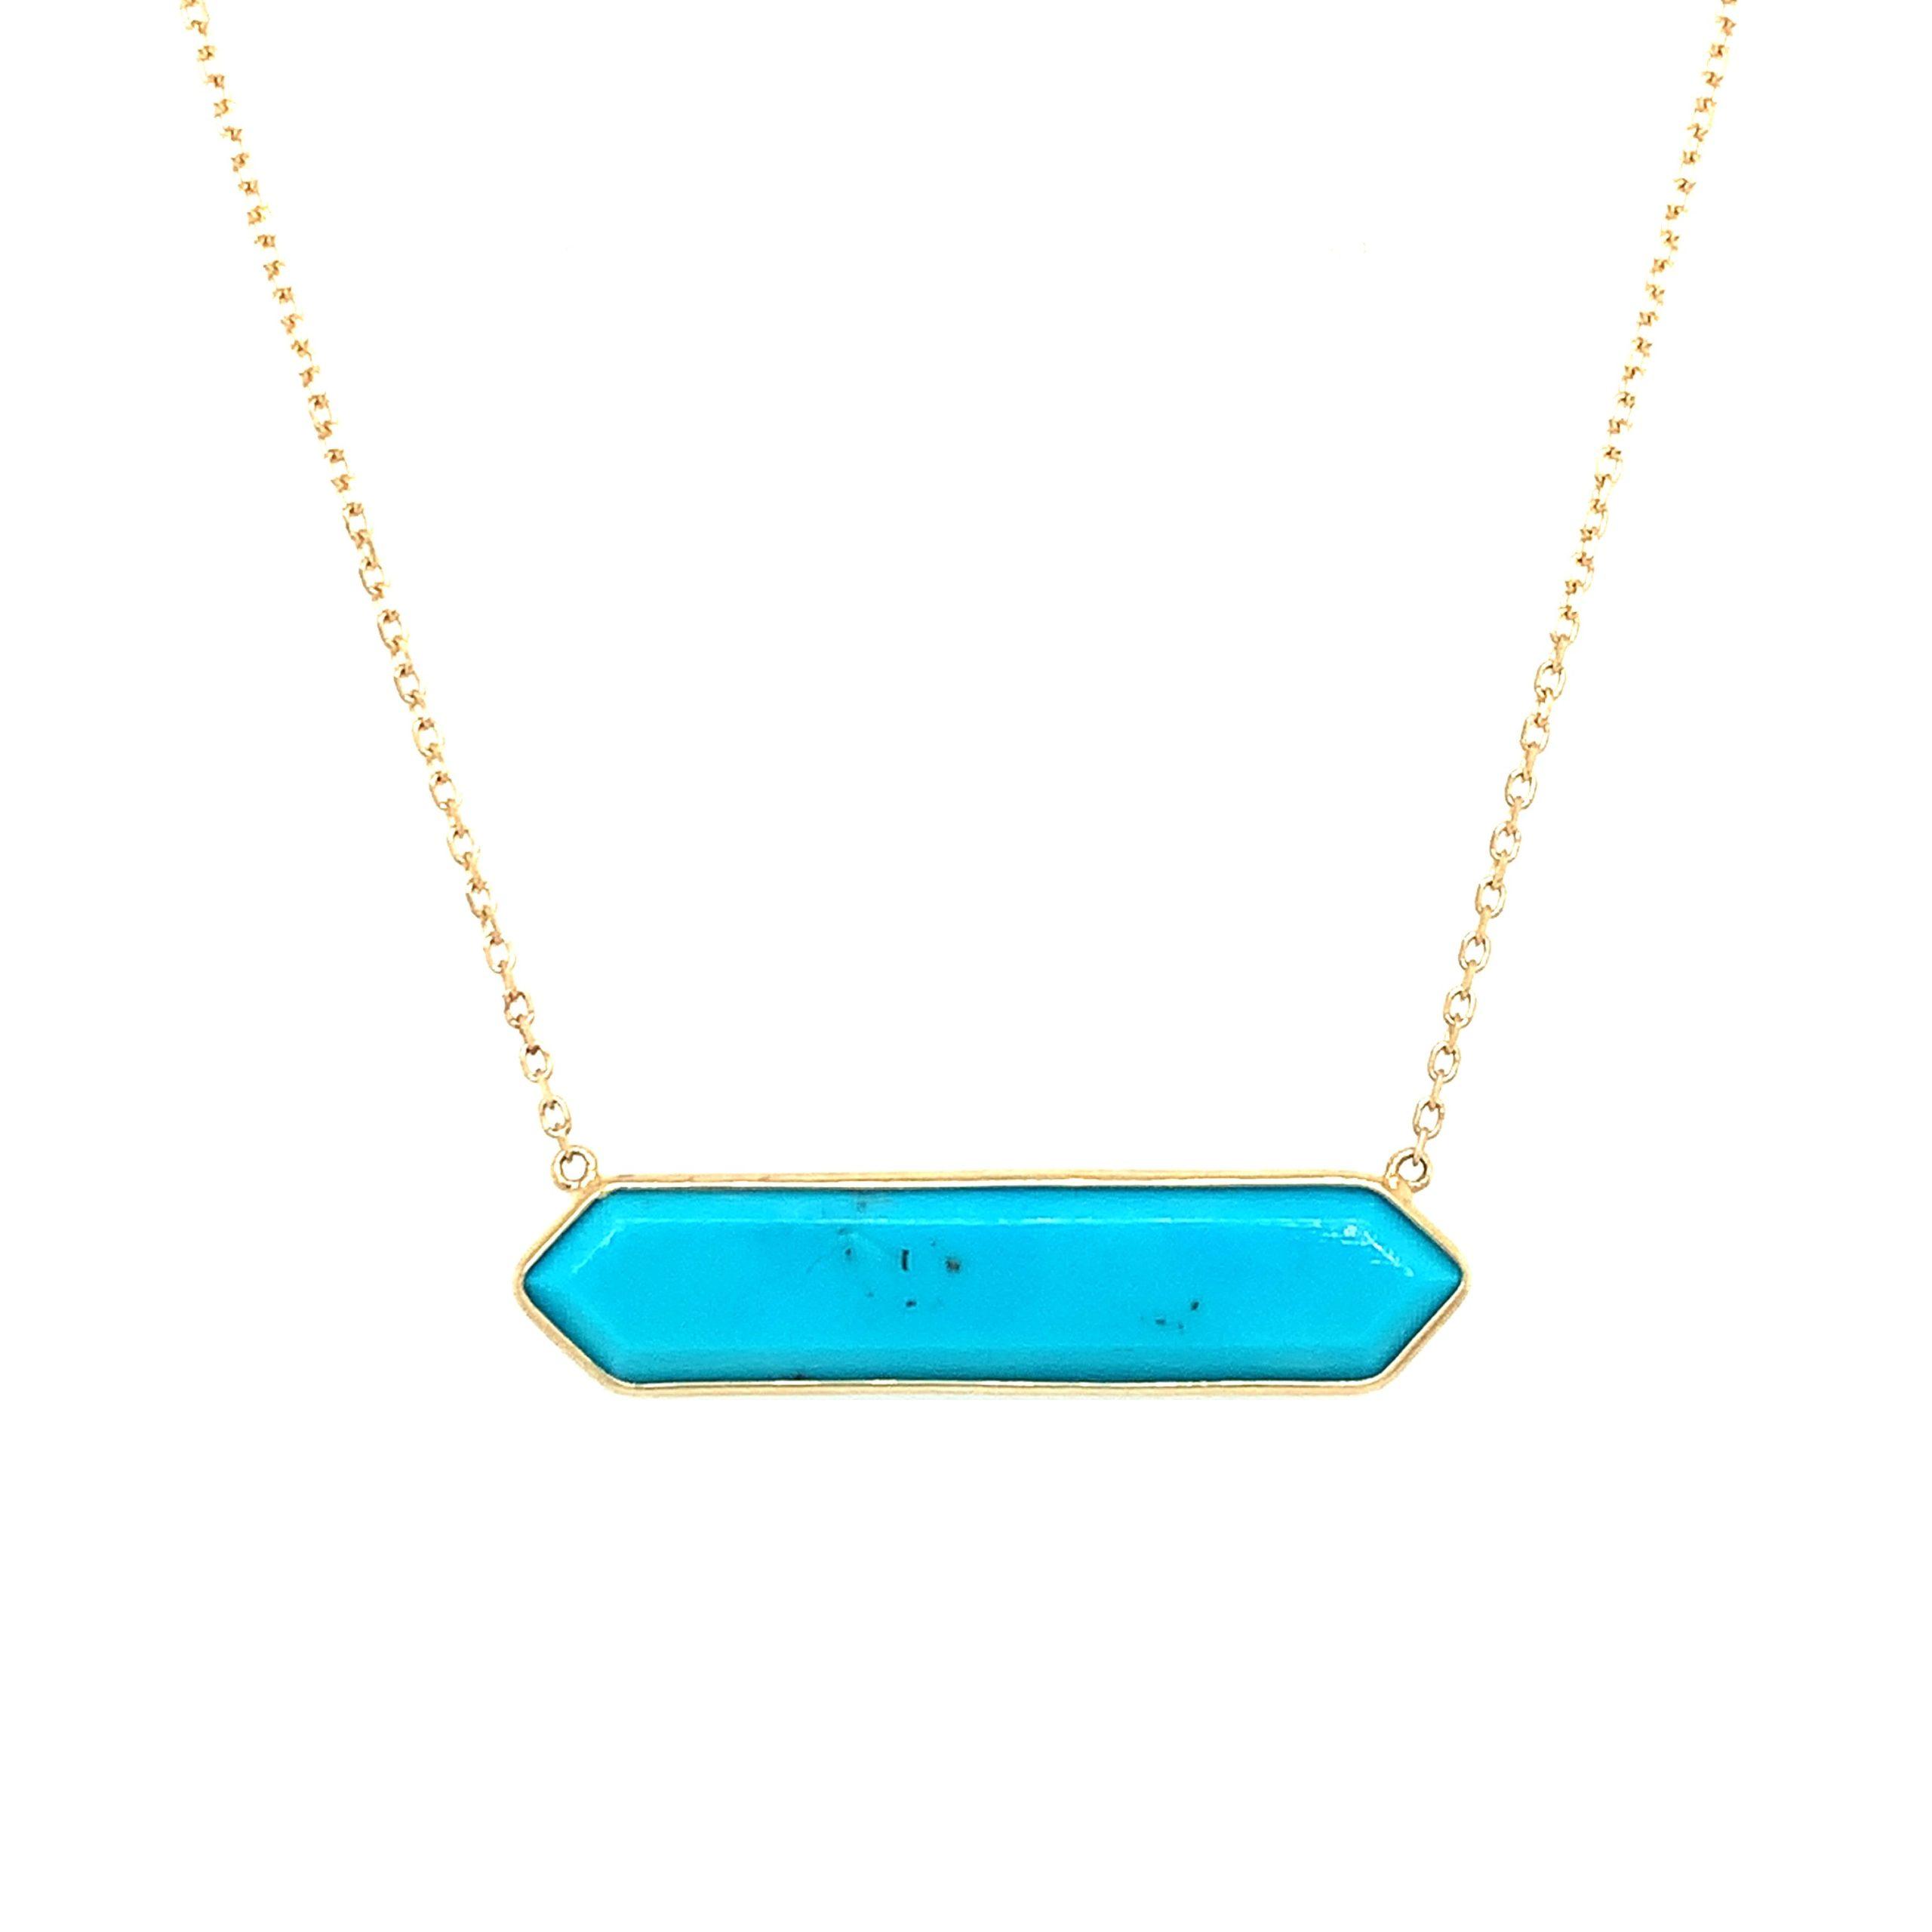 Yellow Gold Hexagonal Turquoise Pendant Necklace